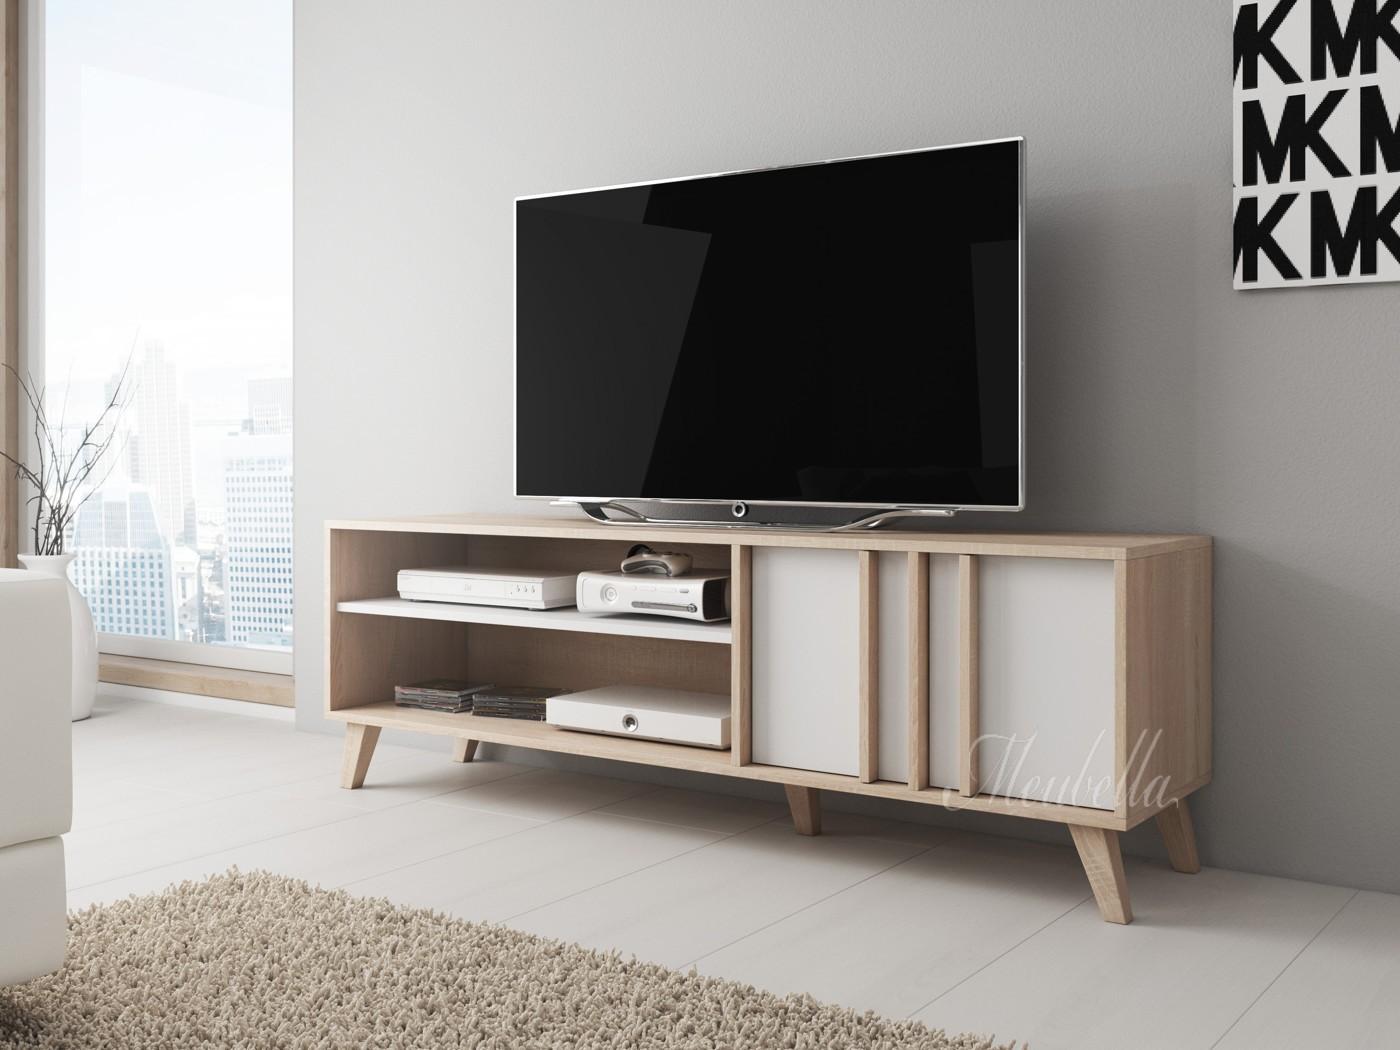 Licht Eiken Meubelen : Tv meubel mira wit licht eiken cm meubella